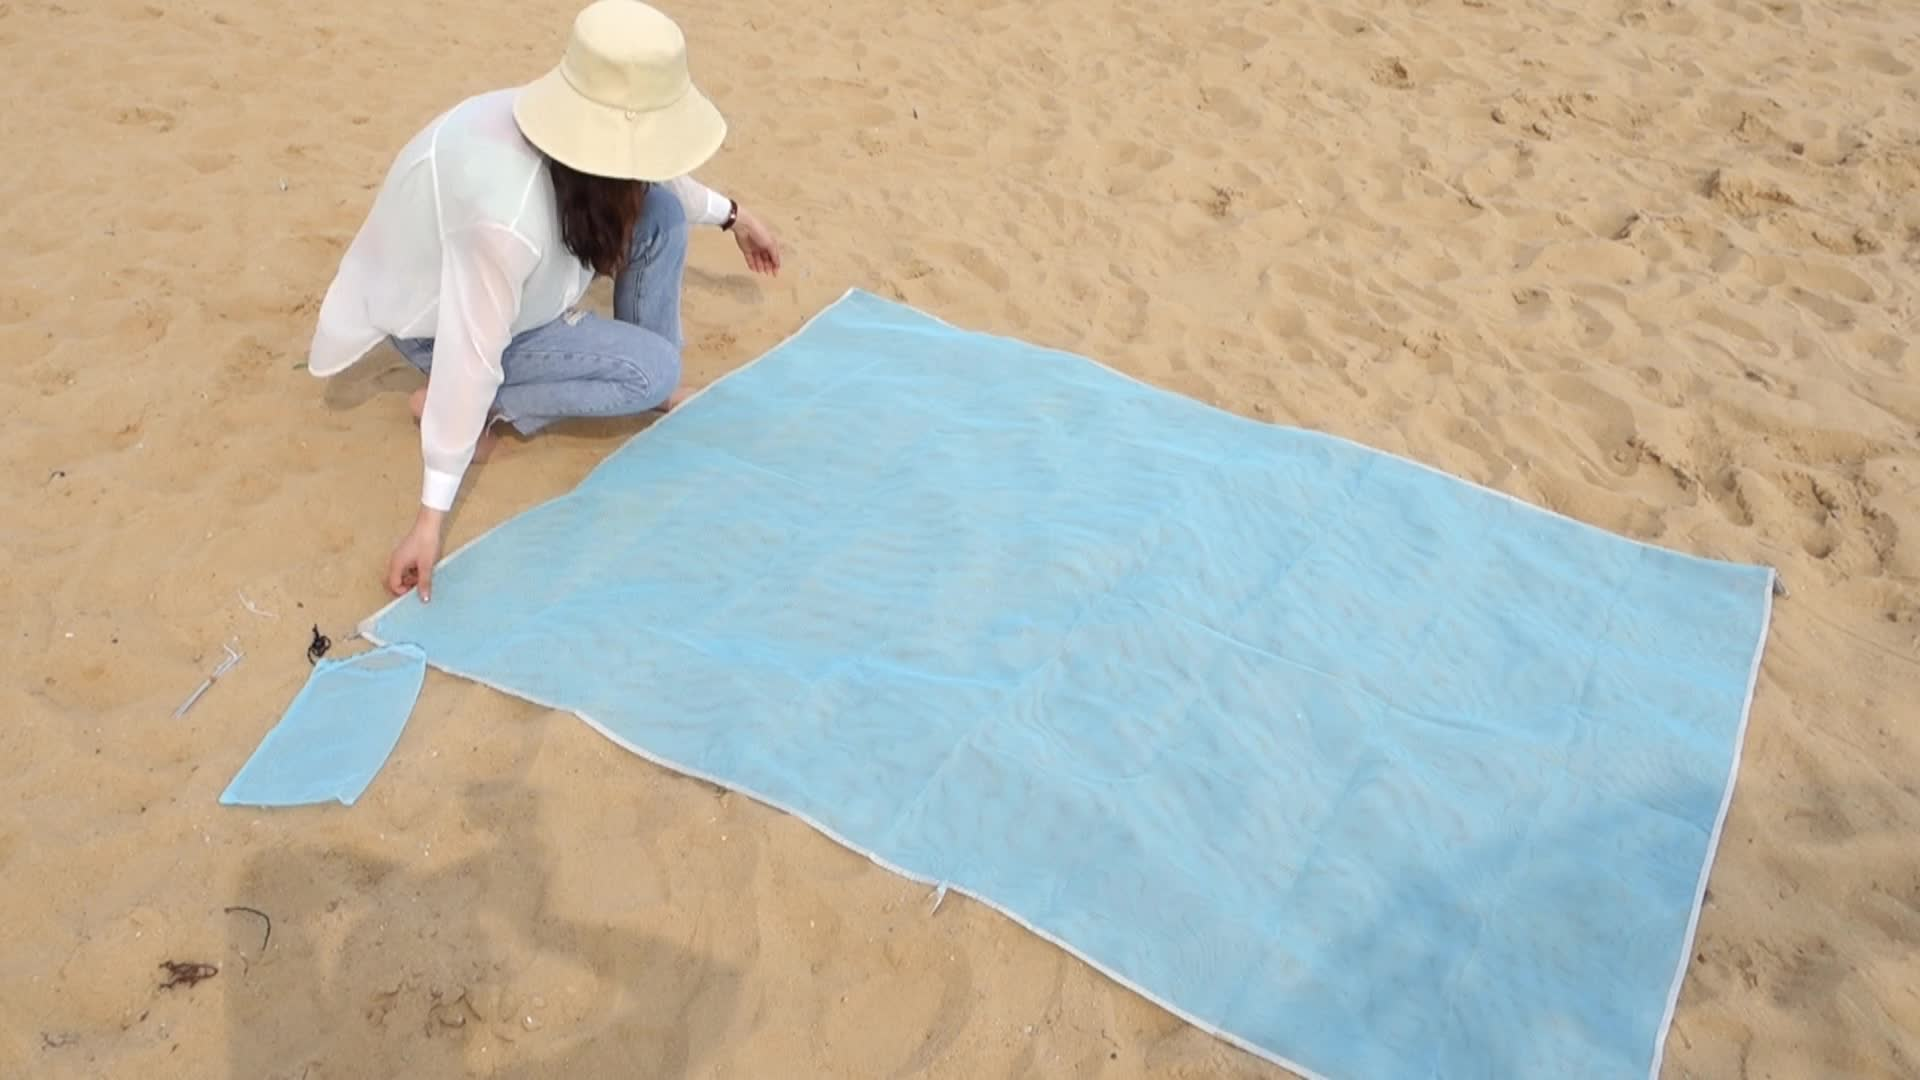 Hoge Kwaliteit 100% Polyester Outdoor Zand Gratis Strand Picknick Mat